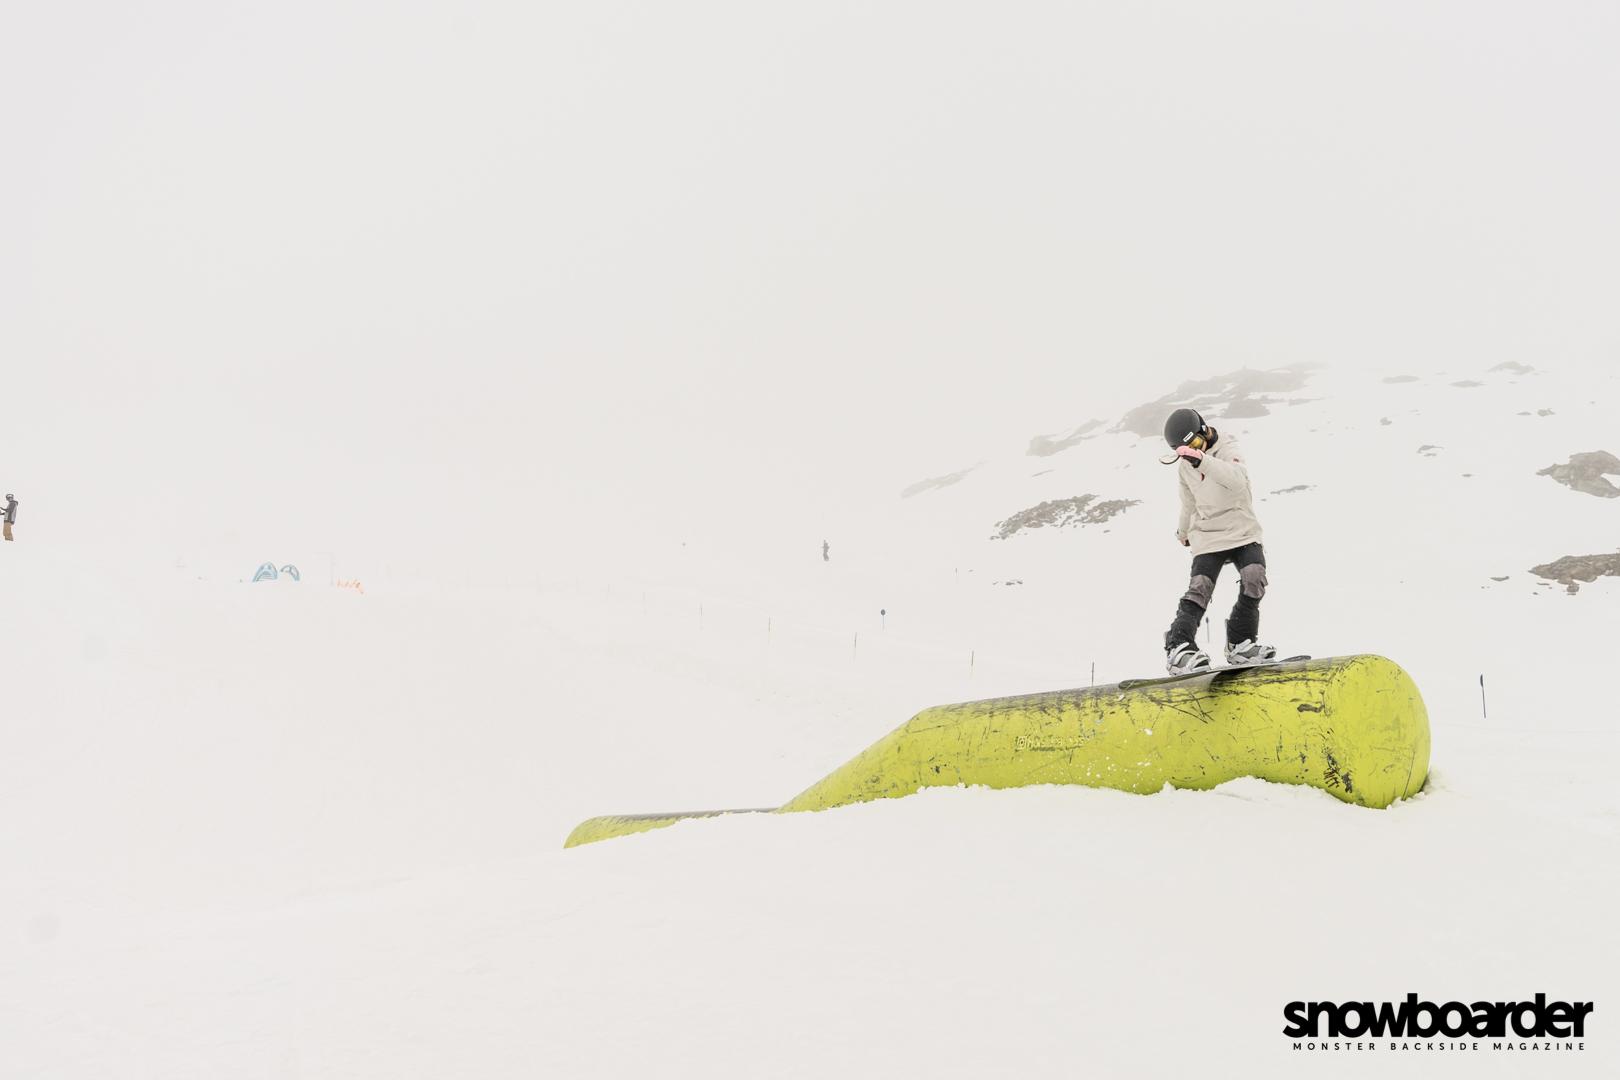 snowboardermbm-63